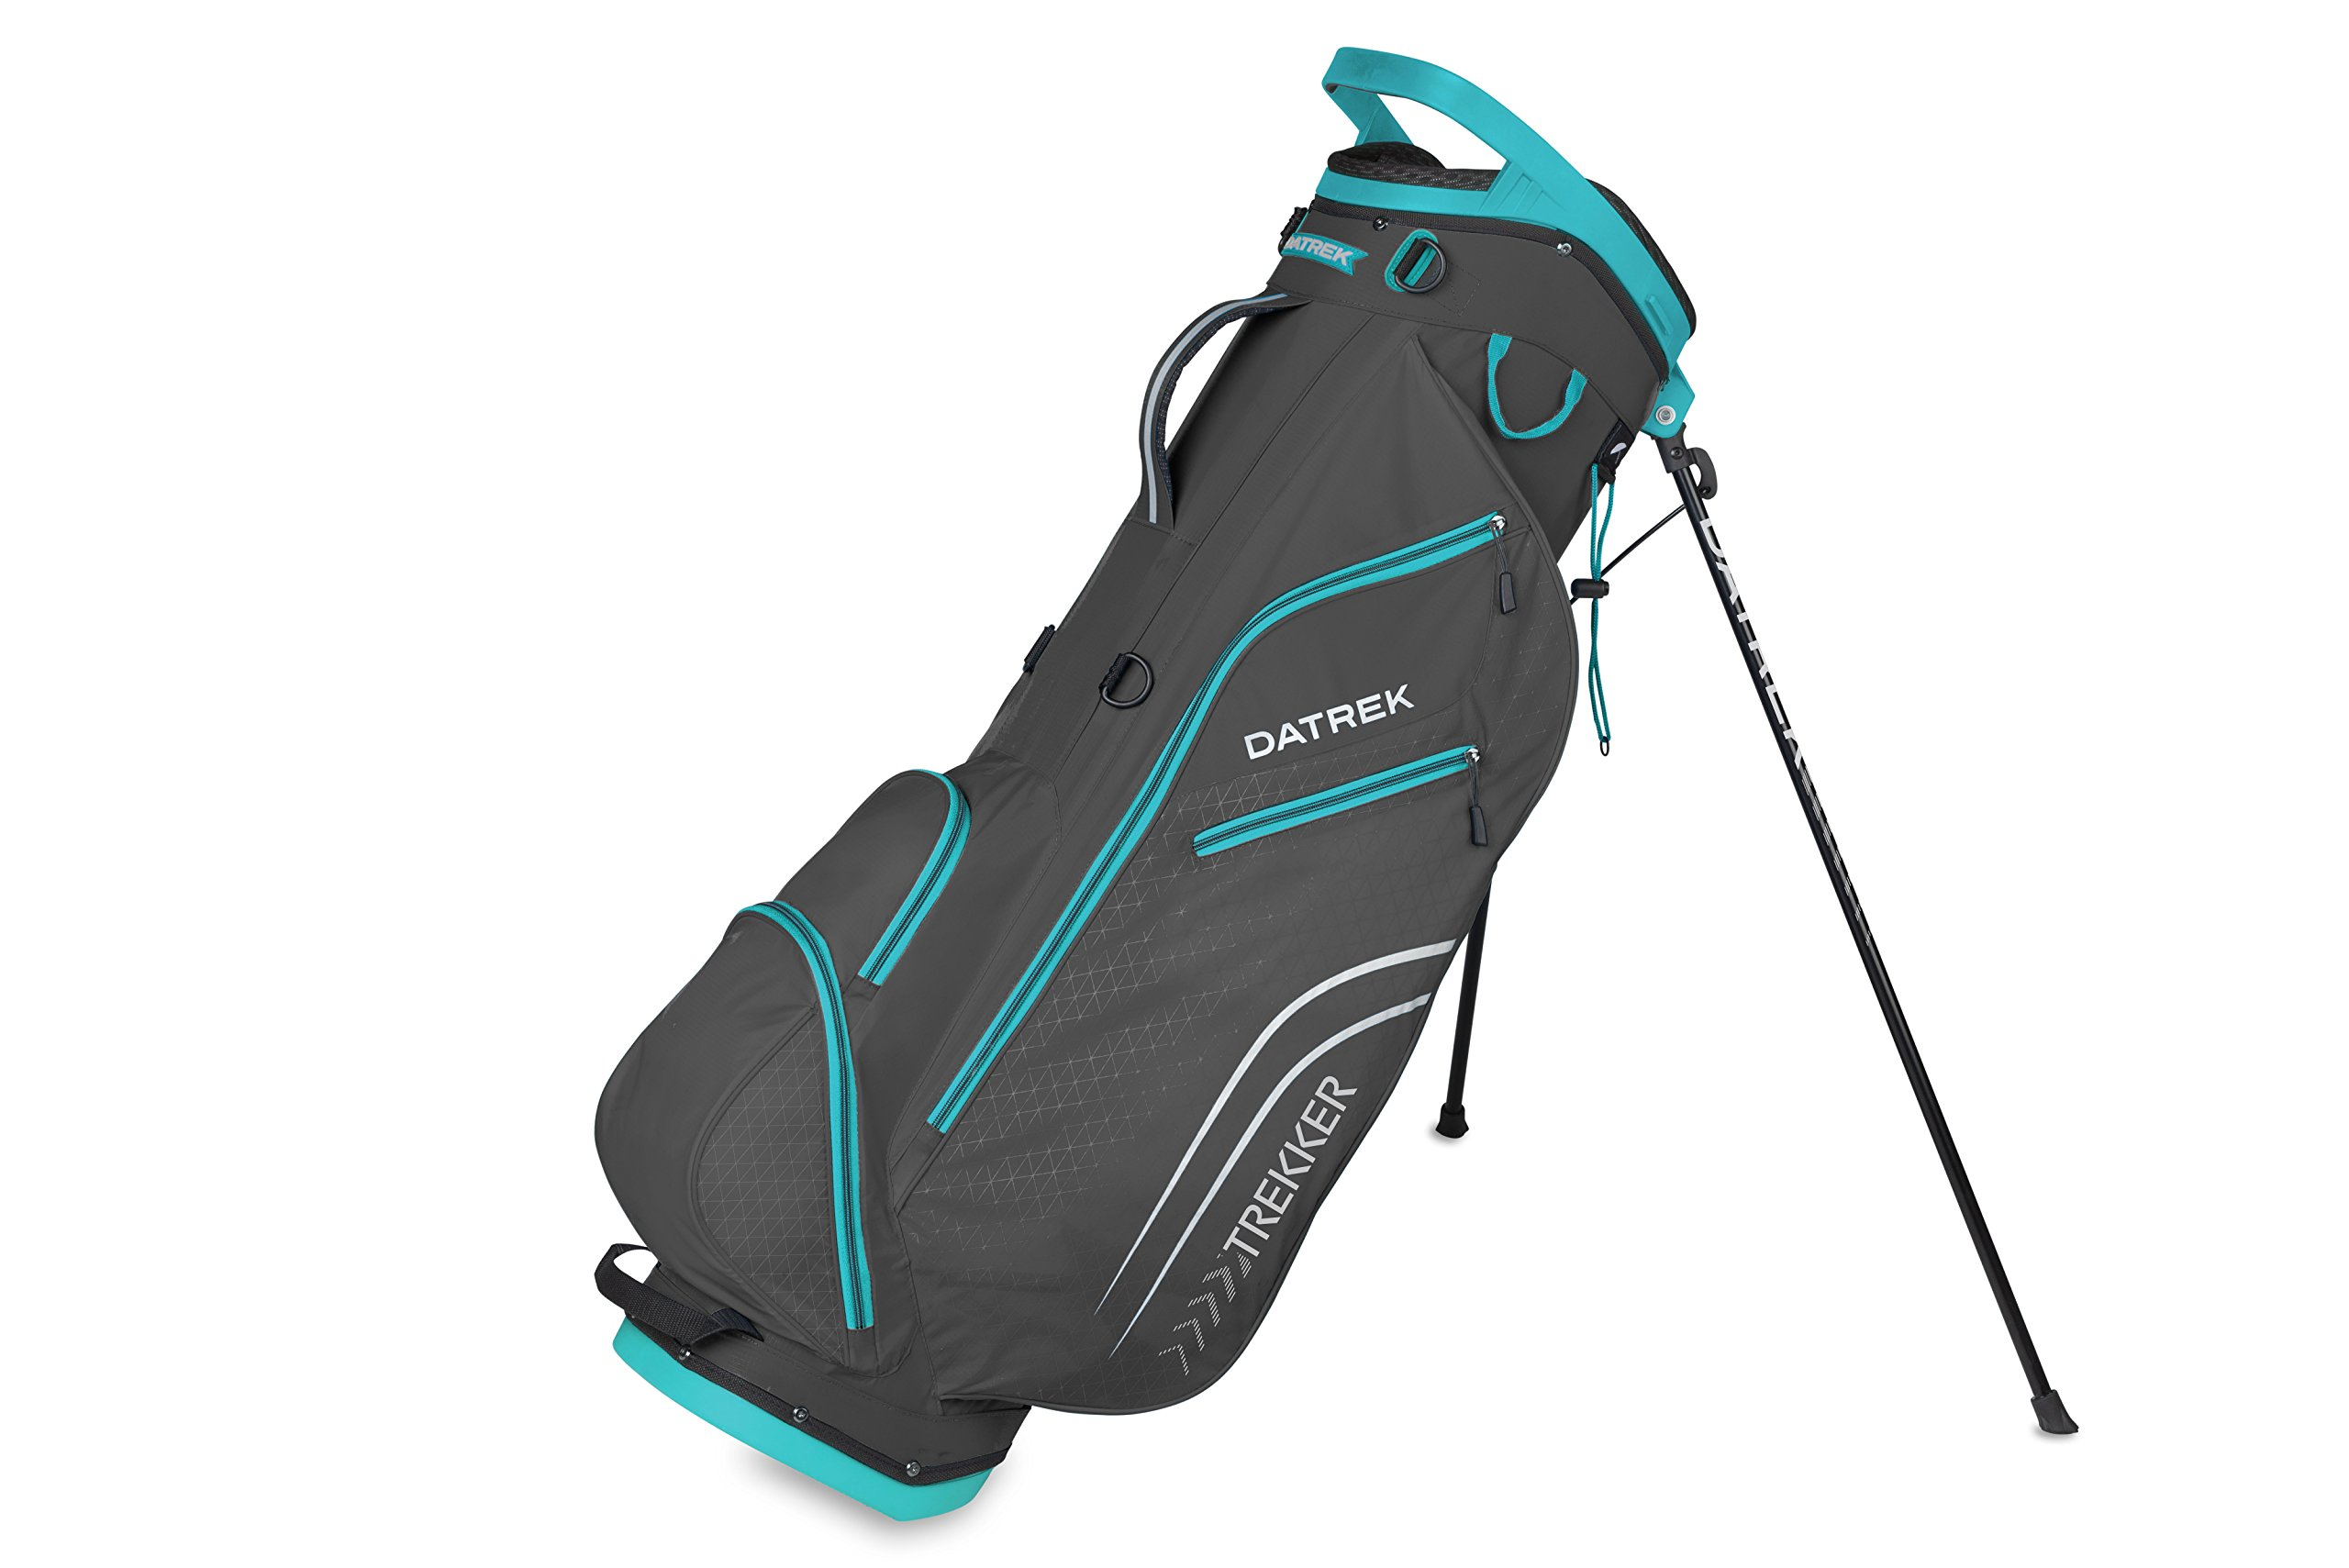 Datrek Golf Trekker Ultra Lite Stand Bag (Charcoal/Turquoise)